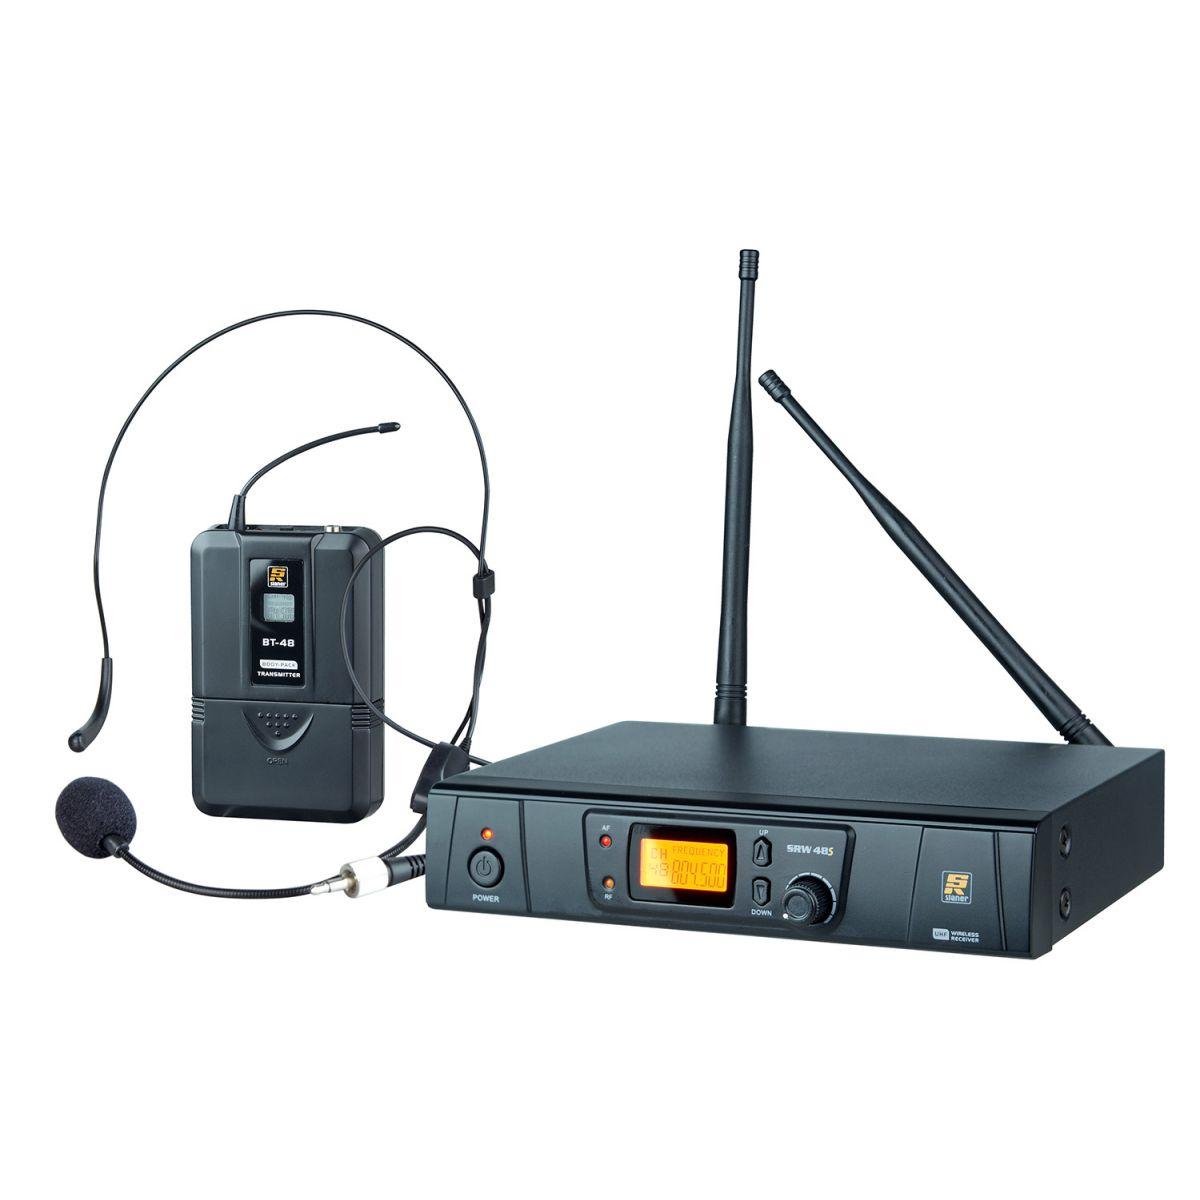 Microfone Sem Fio Headset Staner SRW48S Uhf Digital